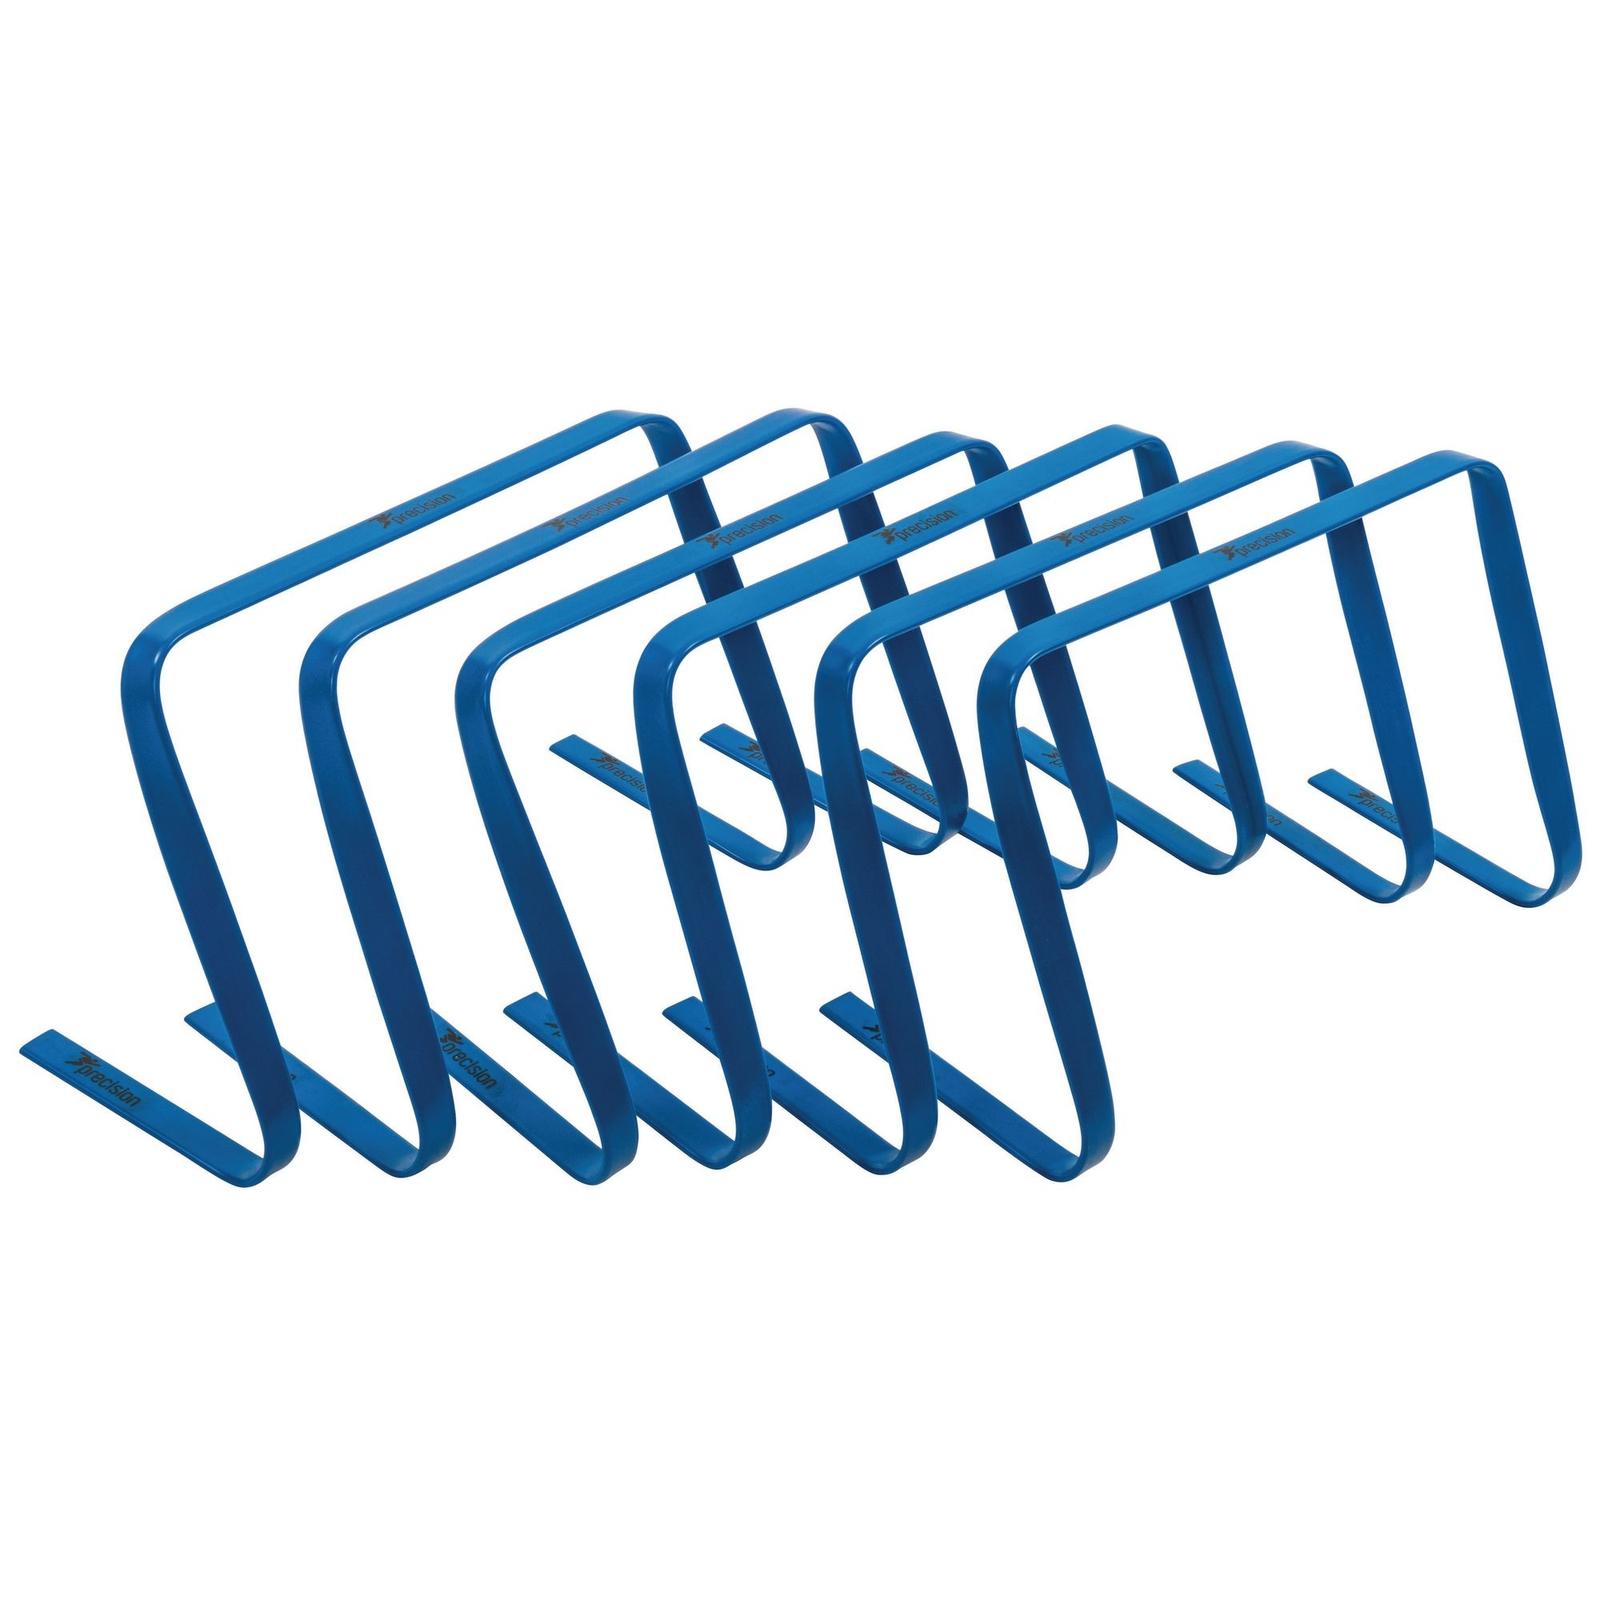 Precision Flat Hurdles - 12in - Blue